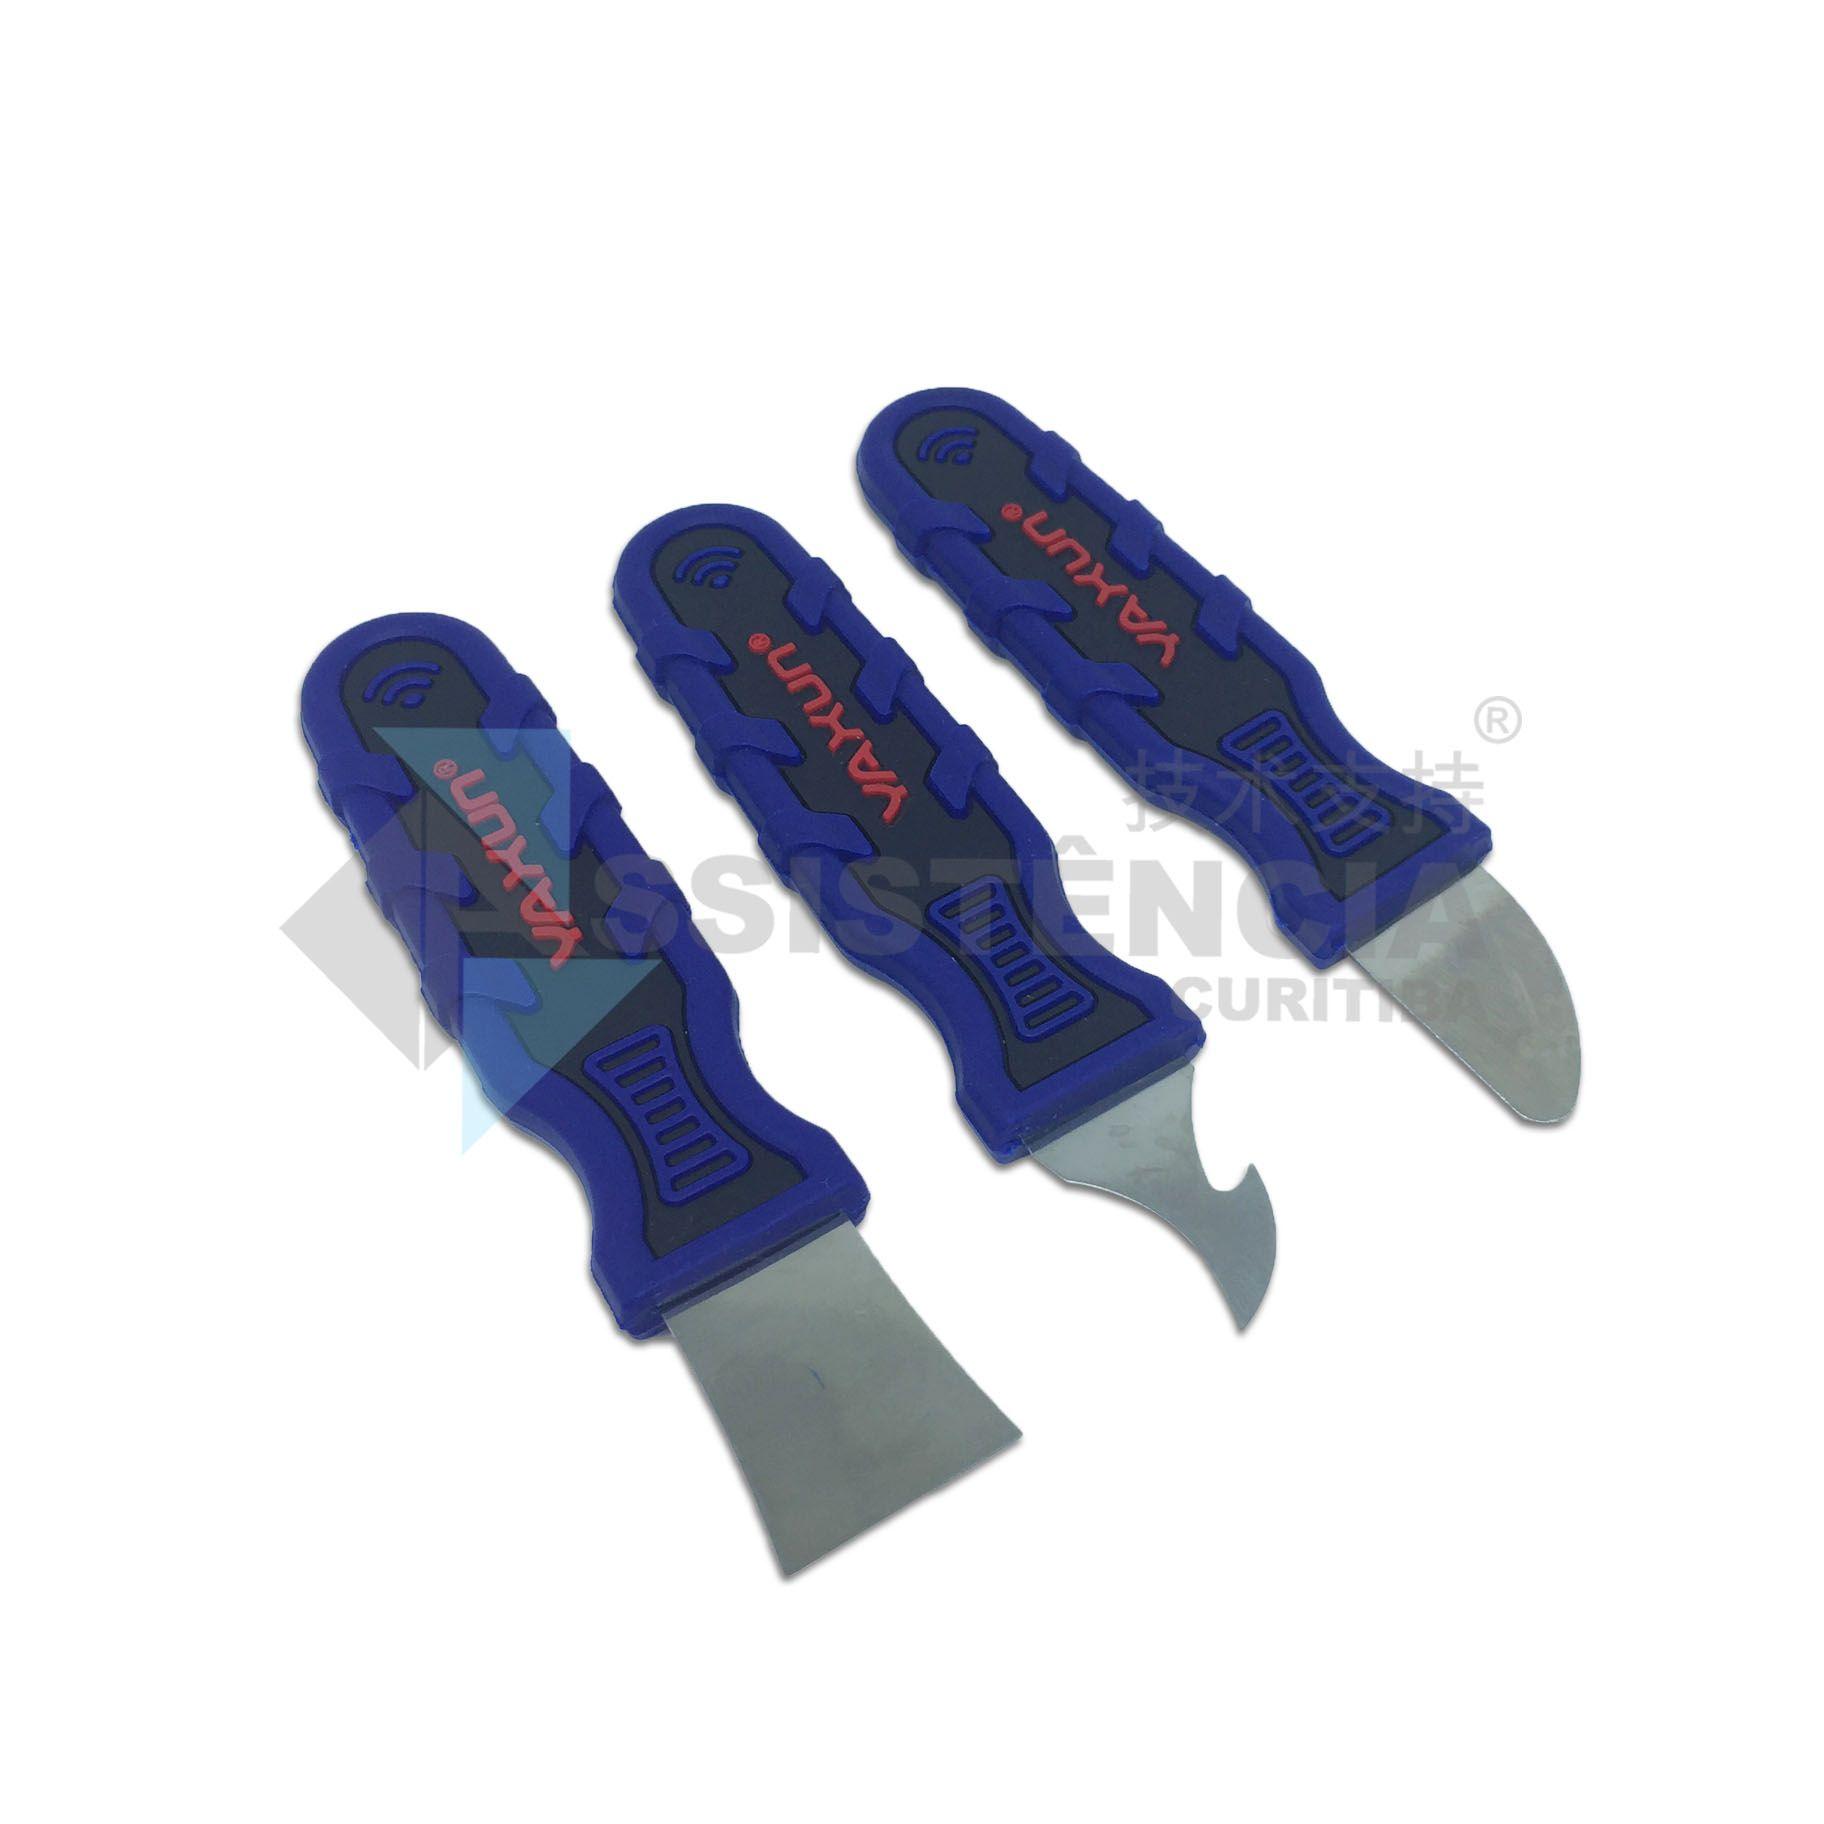 Kit Espátula Laminada Para Abrir Celular Yaxun Yx-5B